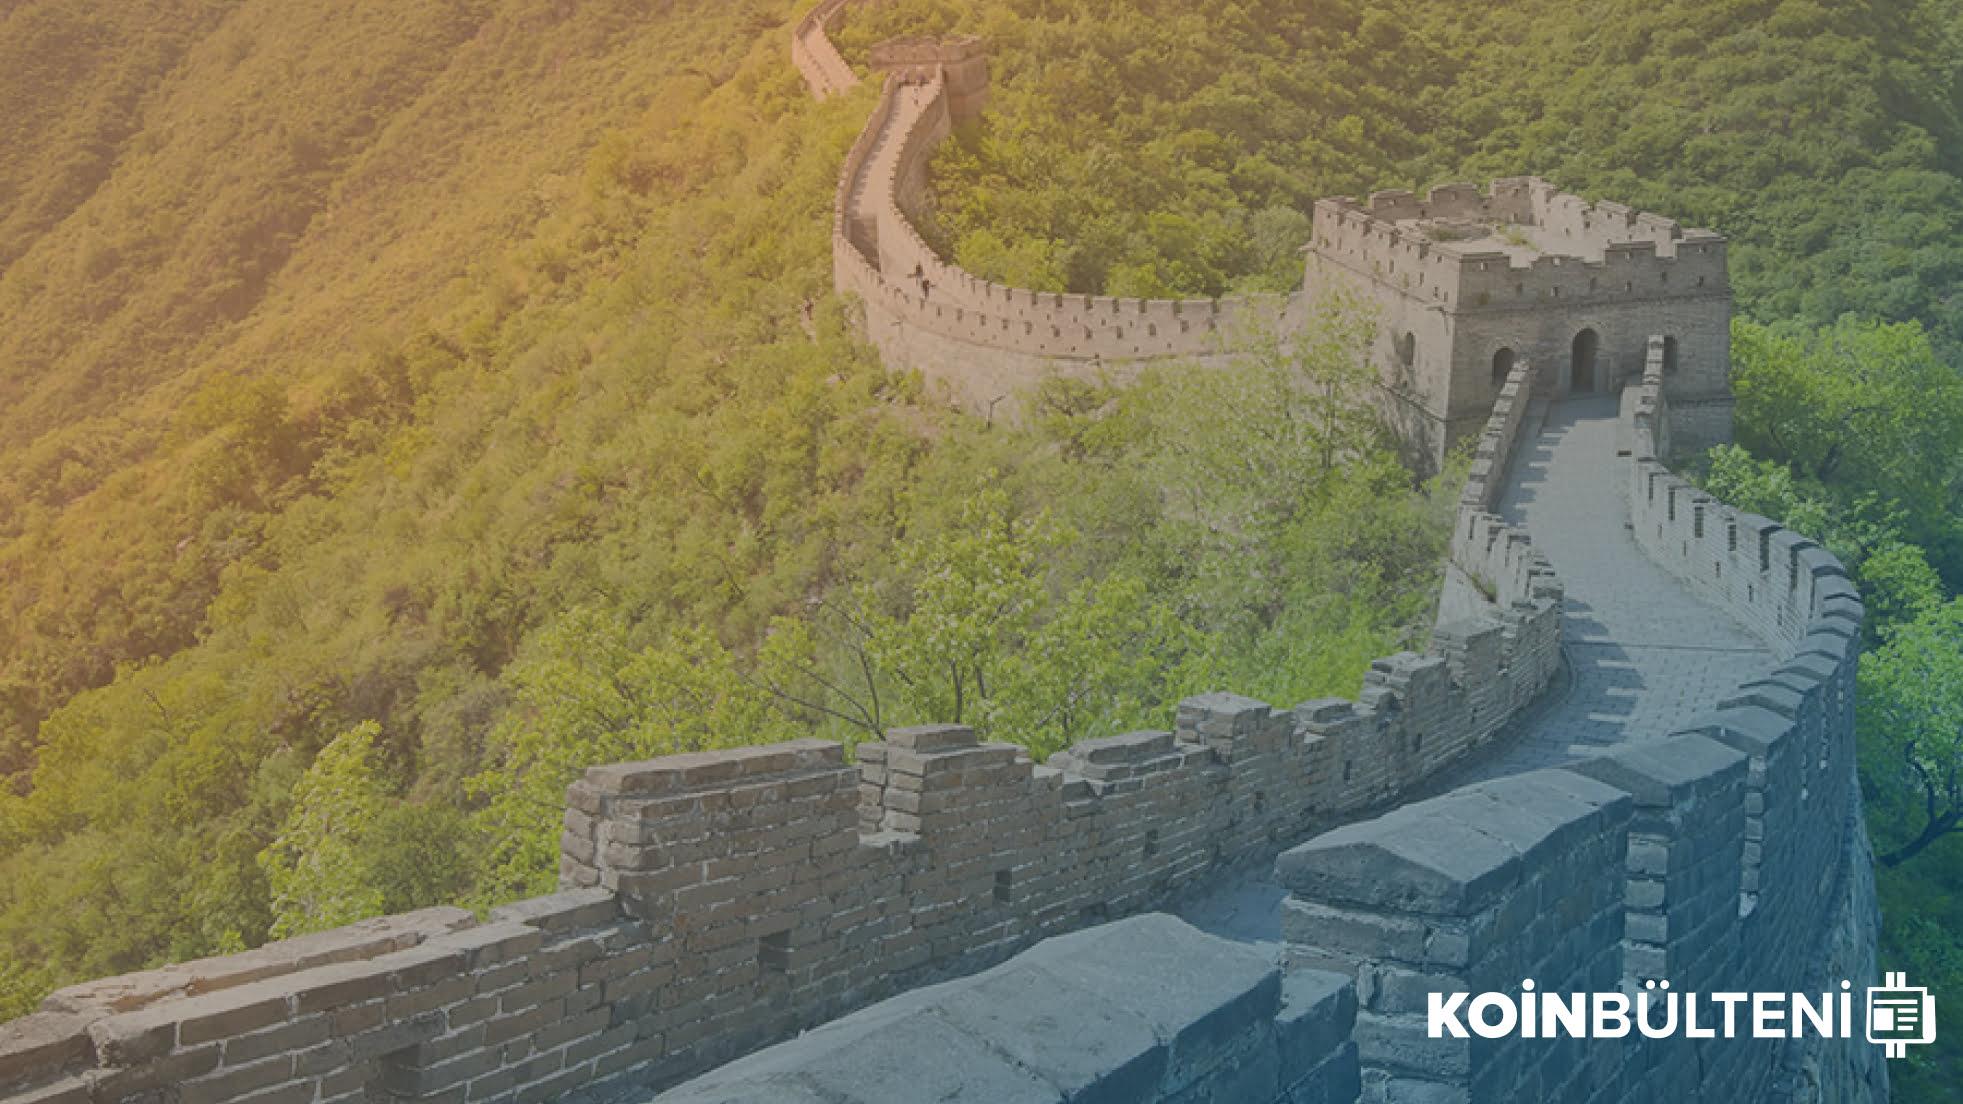 Çin'in kripto para-dcep-dijital para